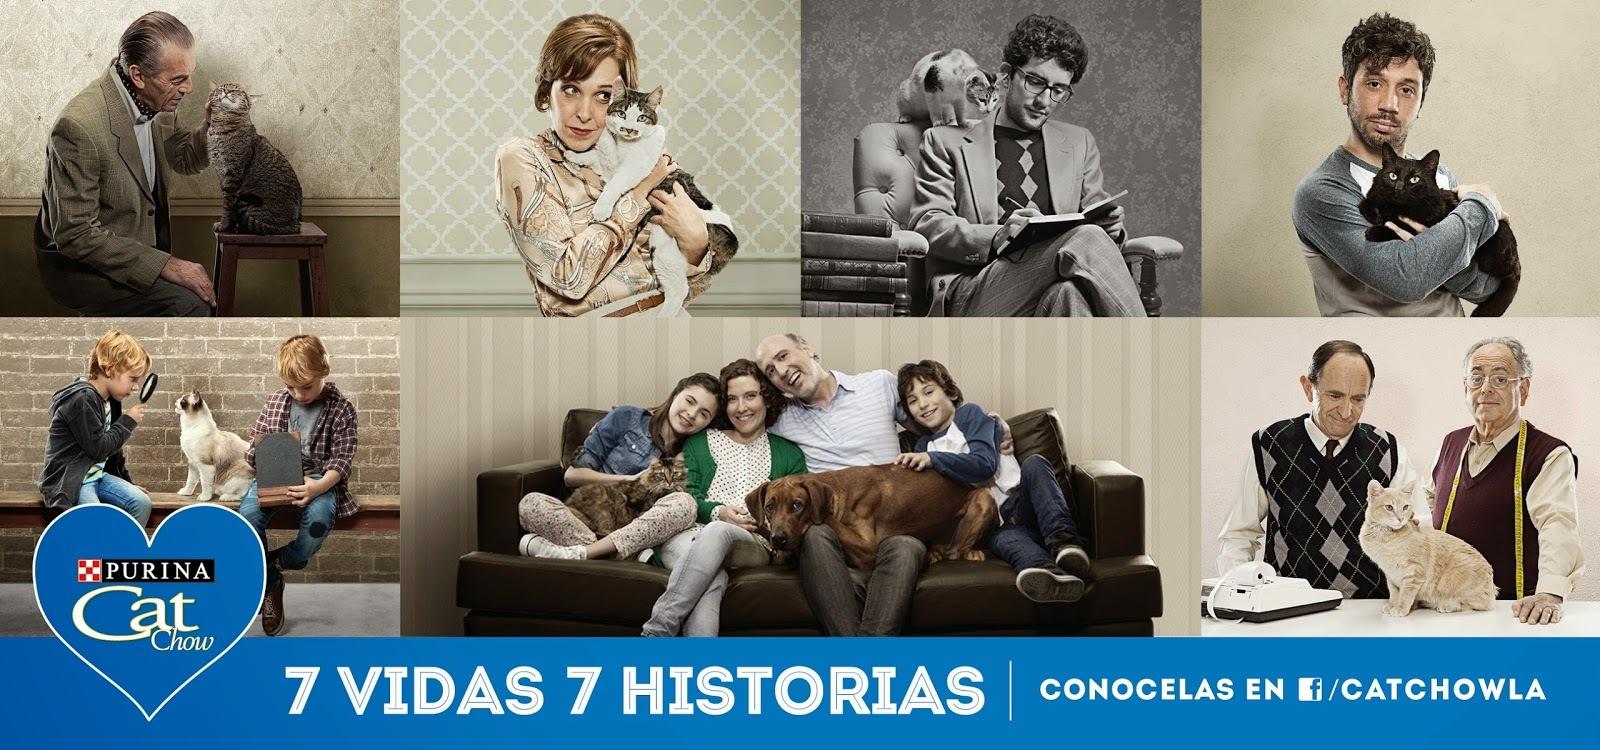 Purina Cat Chow Presenta : #7Vidas7Historias !!!